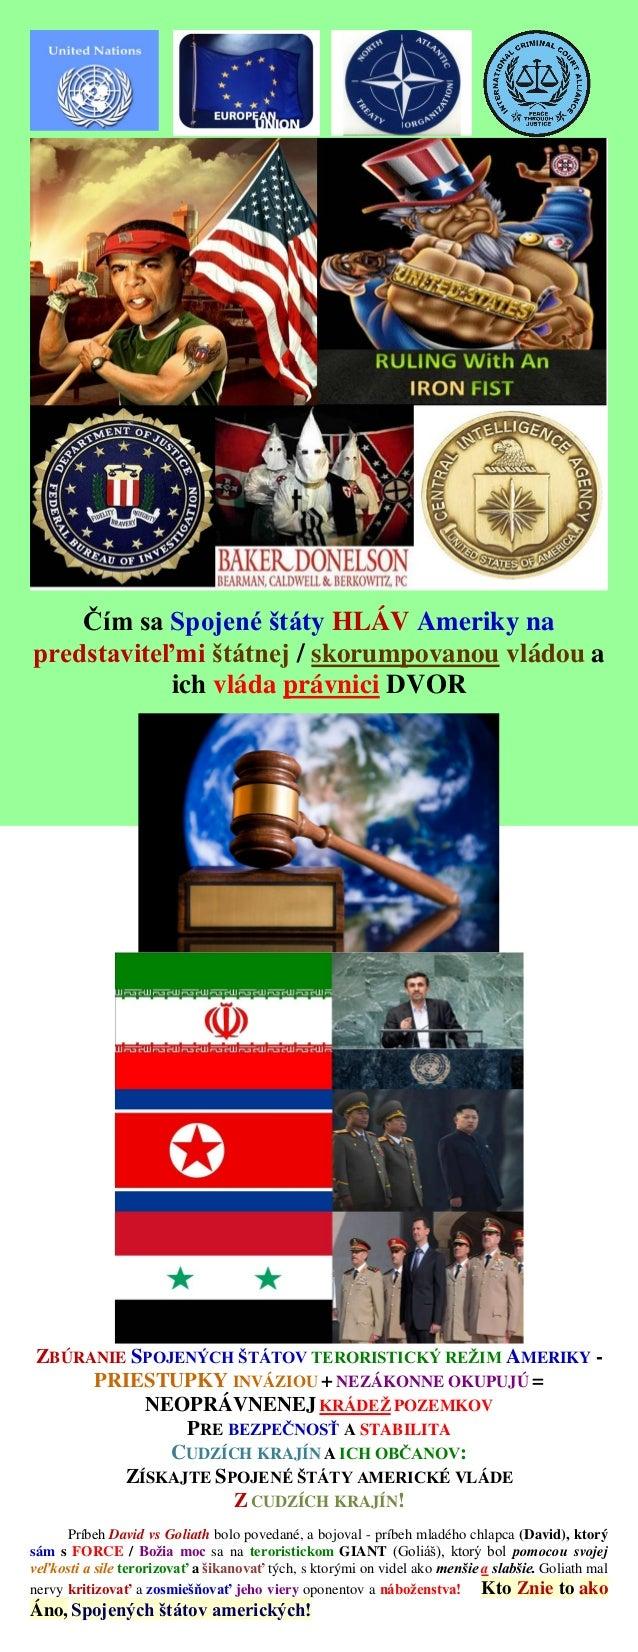 041413 - PUBLIC NOTICE (031113 Fax To Barack Obama) - slovenian